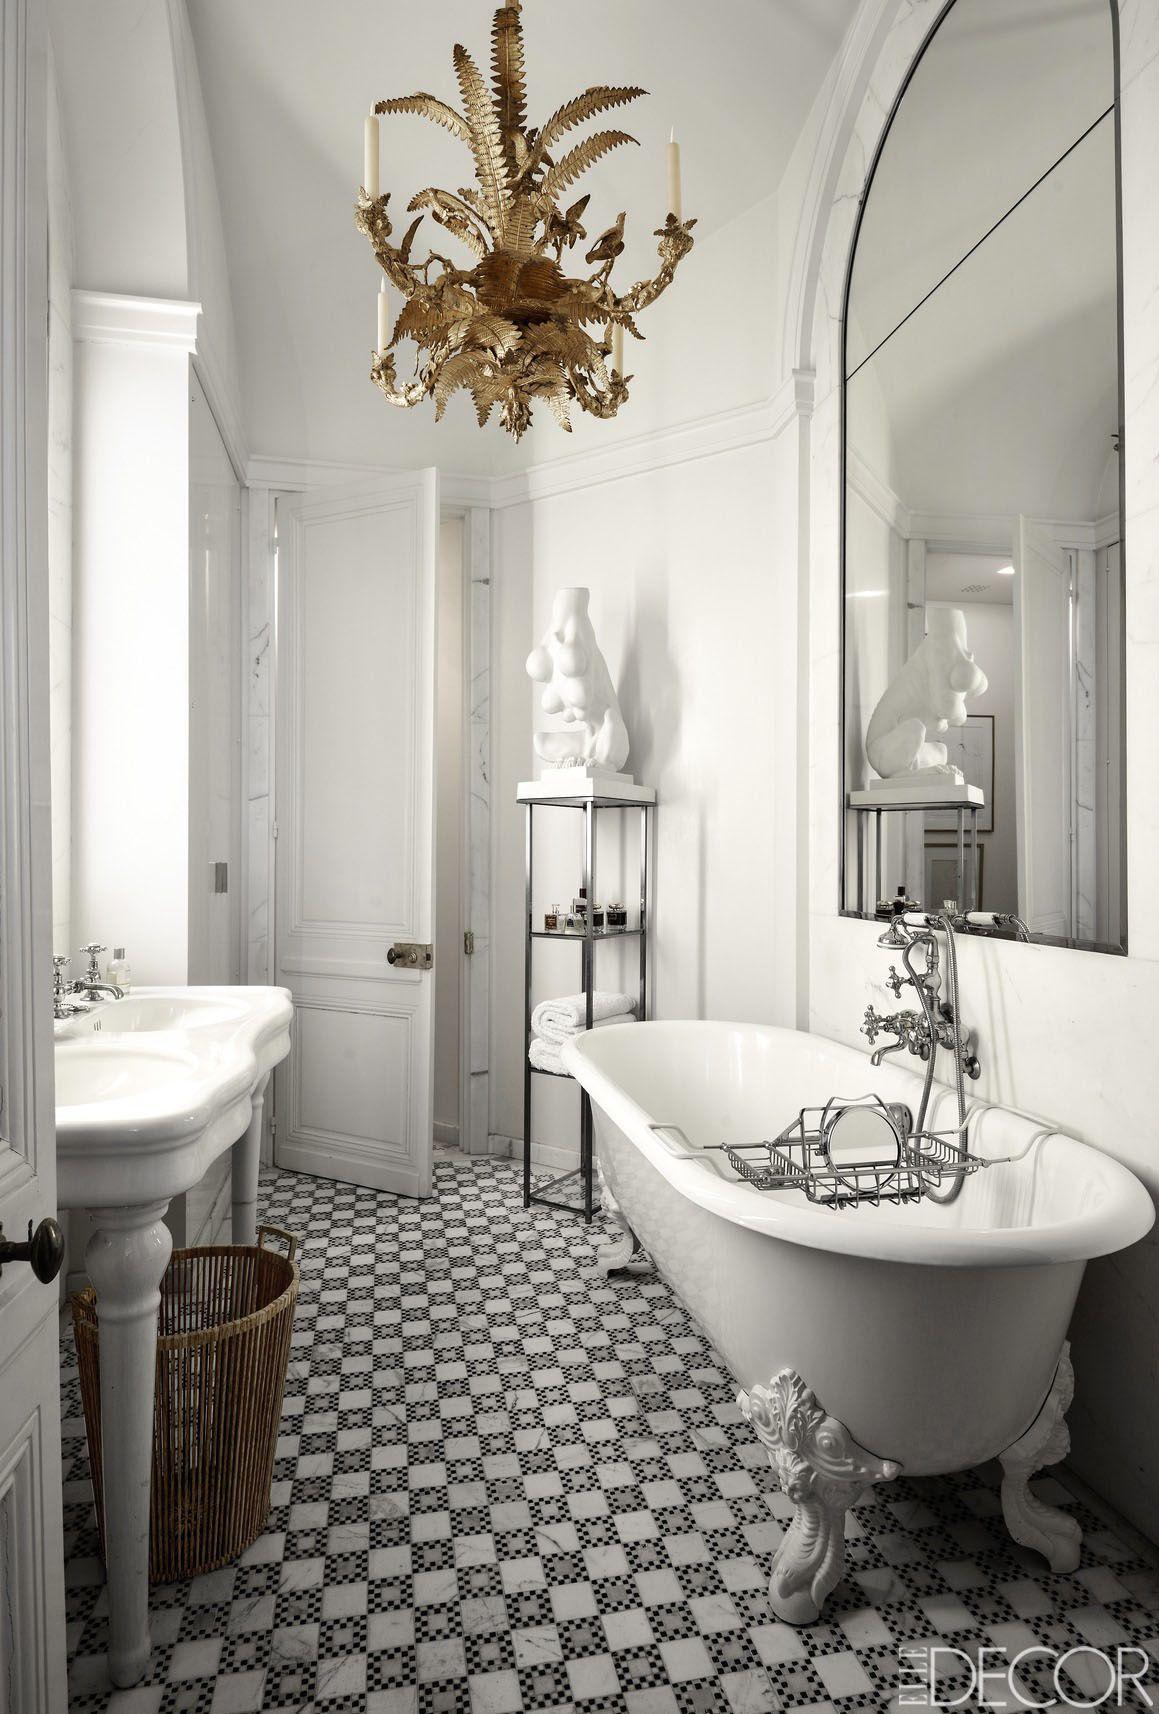 80 Of The Most Beautiful Designer Bathrooms We\'ve Ever Seen ...